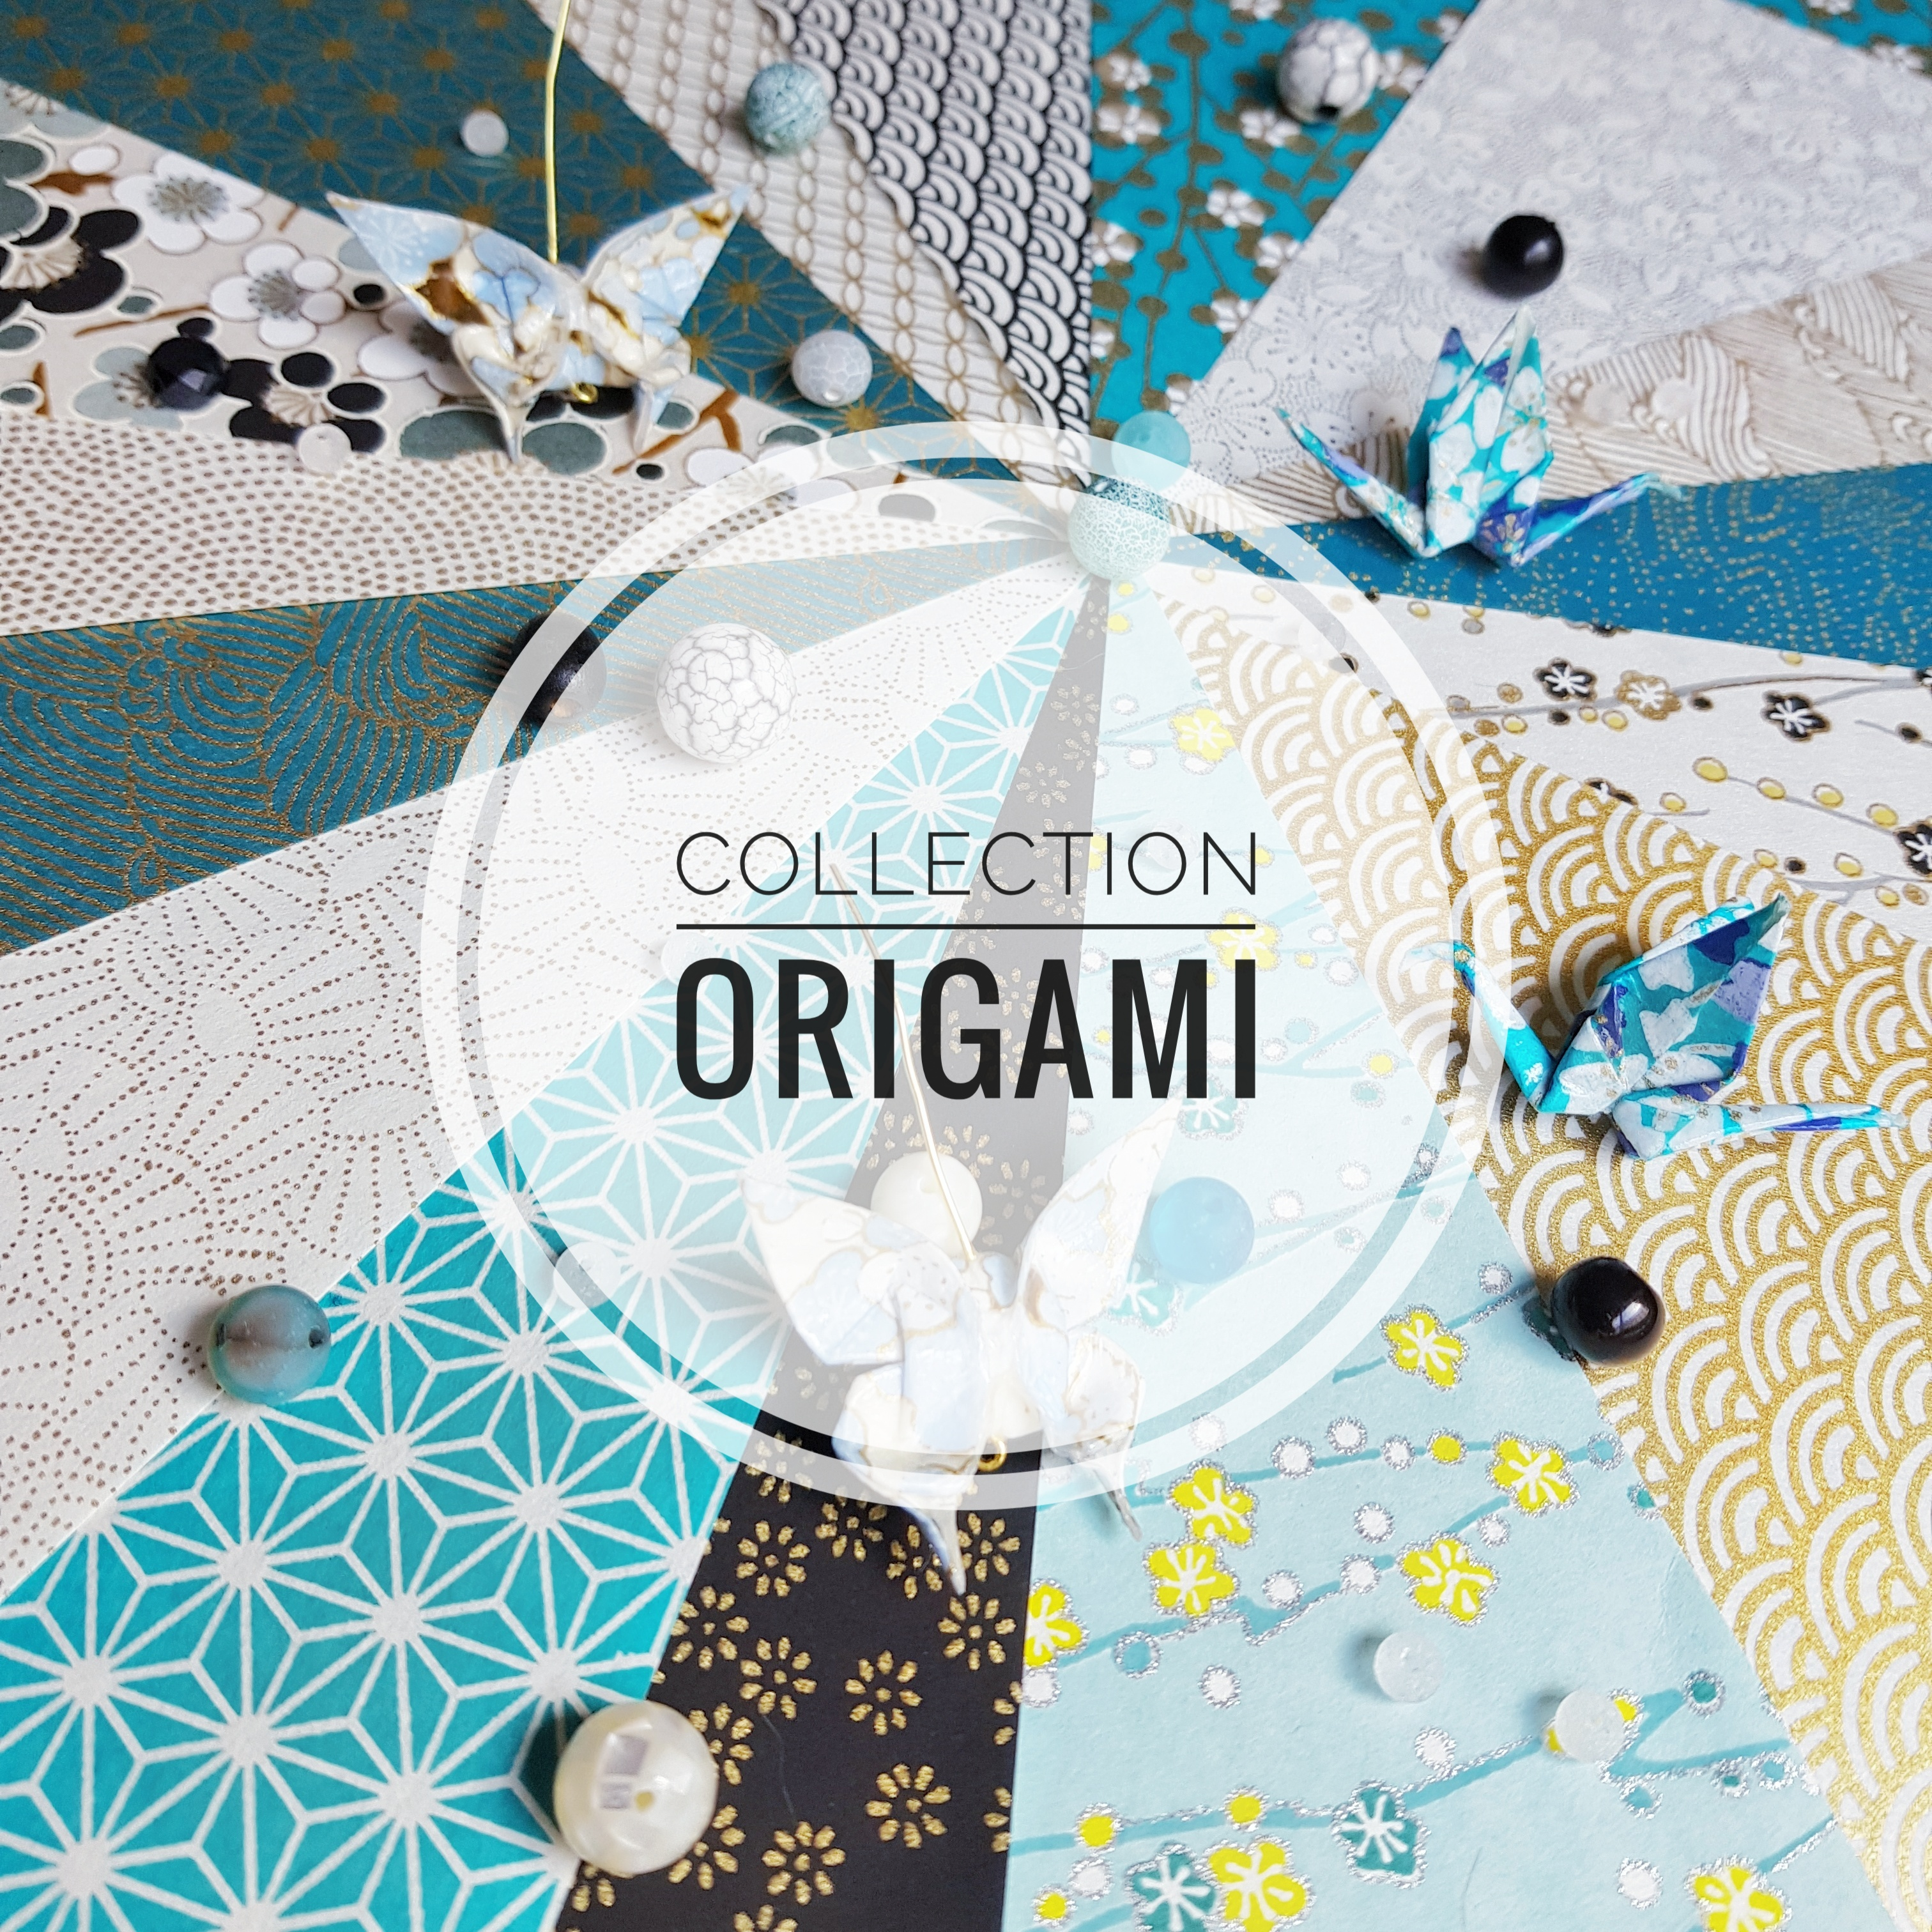 Gebetnout-bijoux-fantaisie-lyon-mode-tendance-bijouterie-femme-Oullins-artisan-catégorie-origami